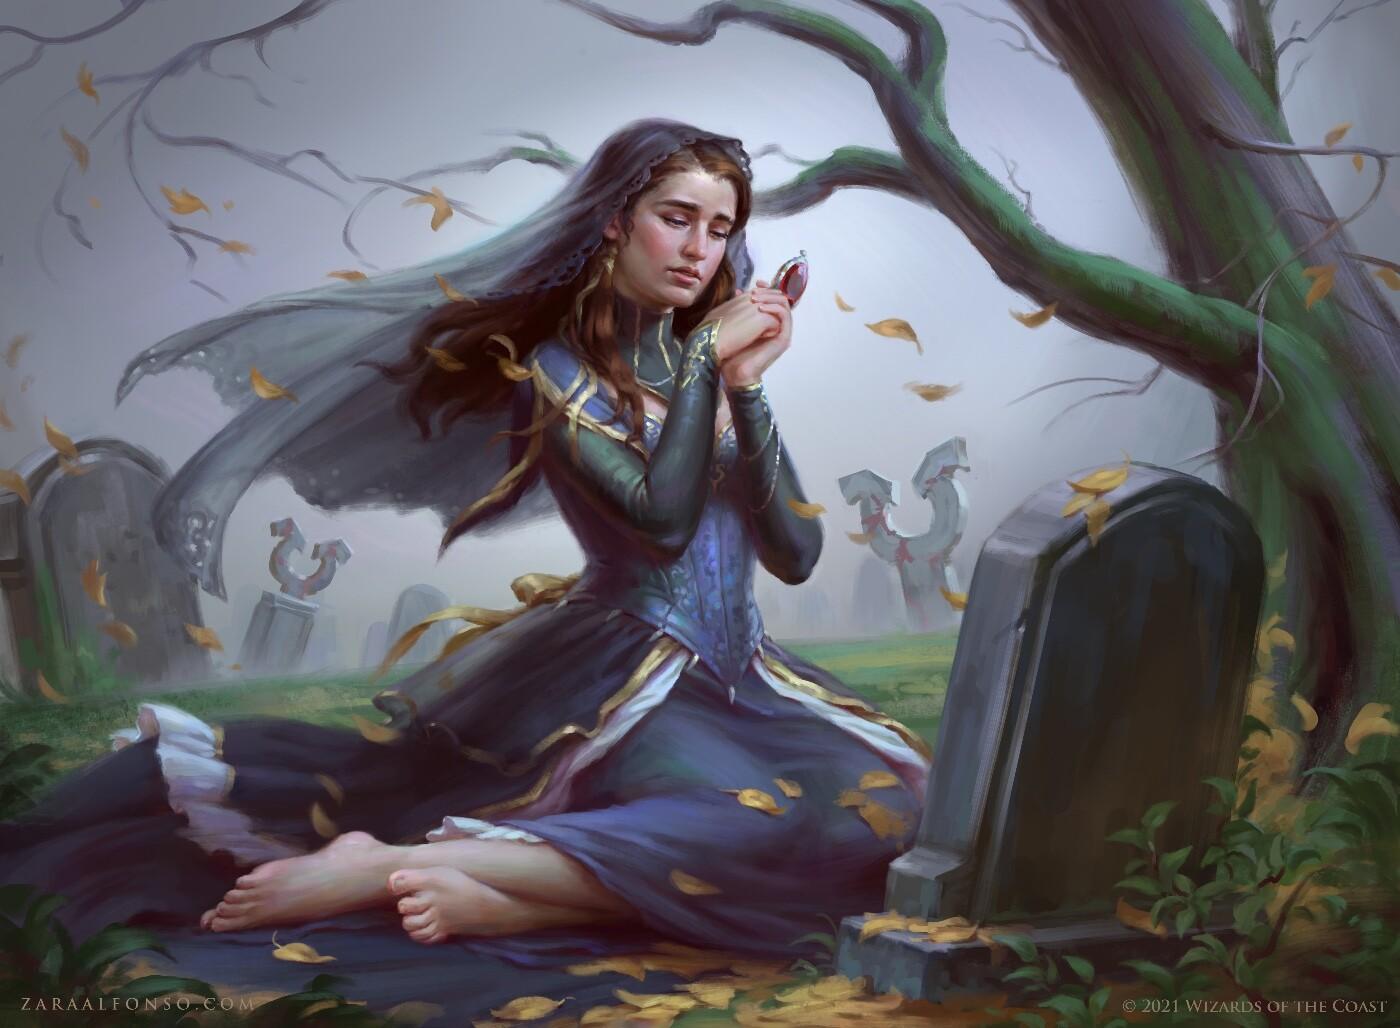 Bereaved Survivor Art by Zara Alfonso